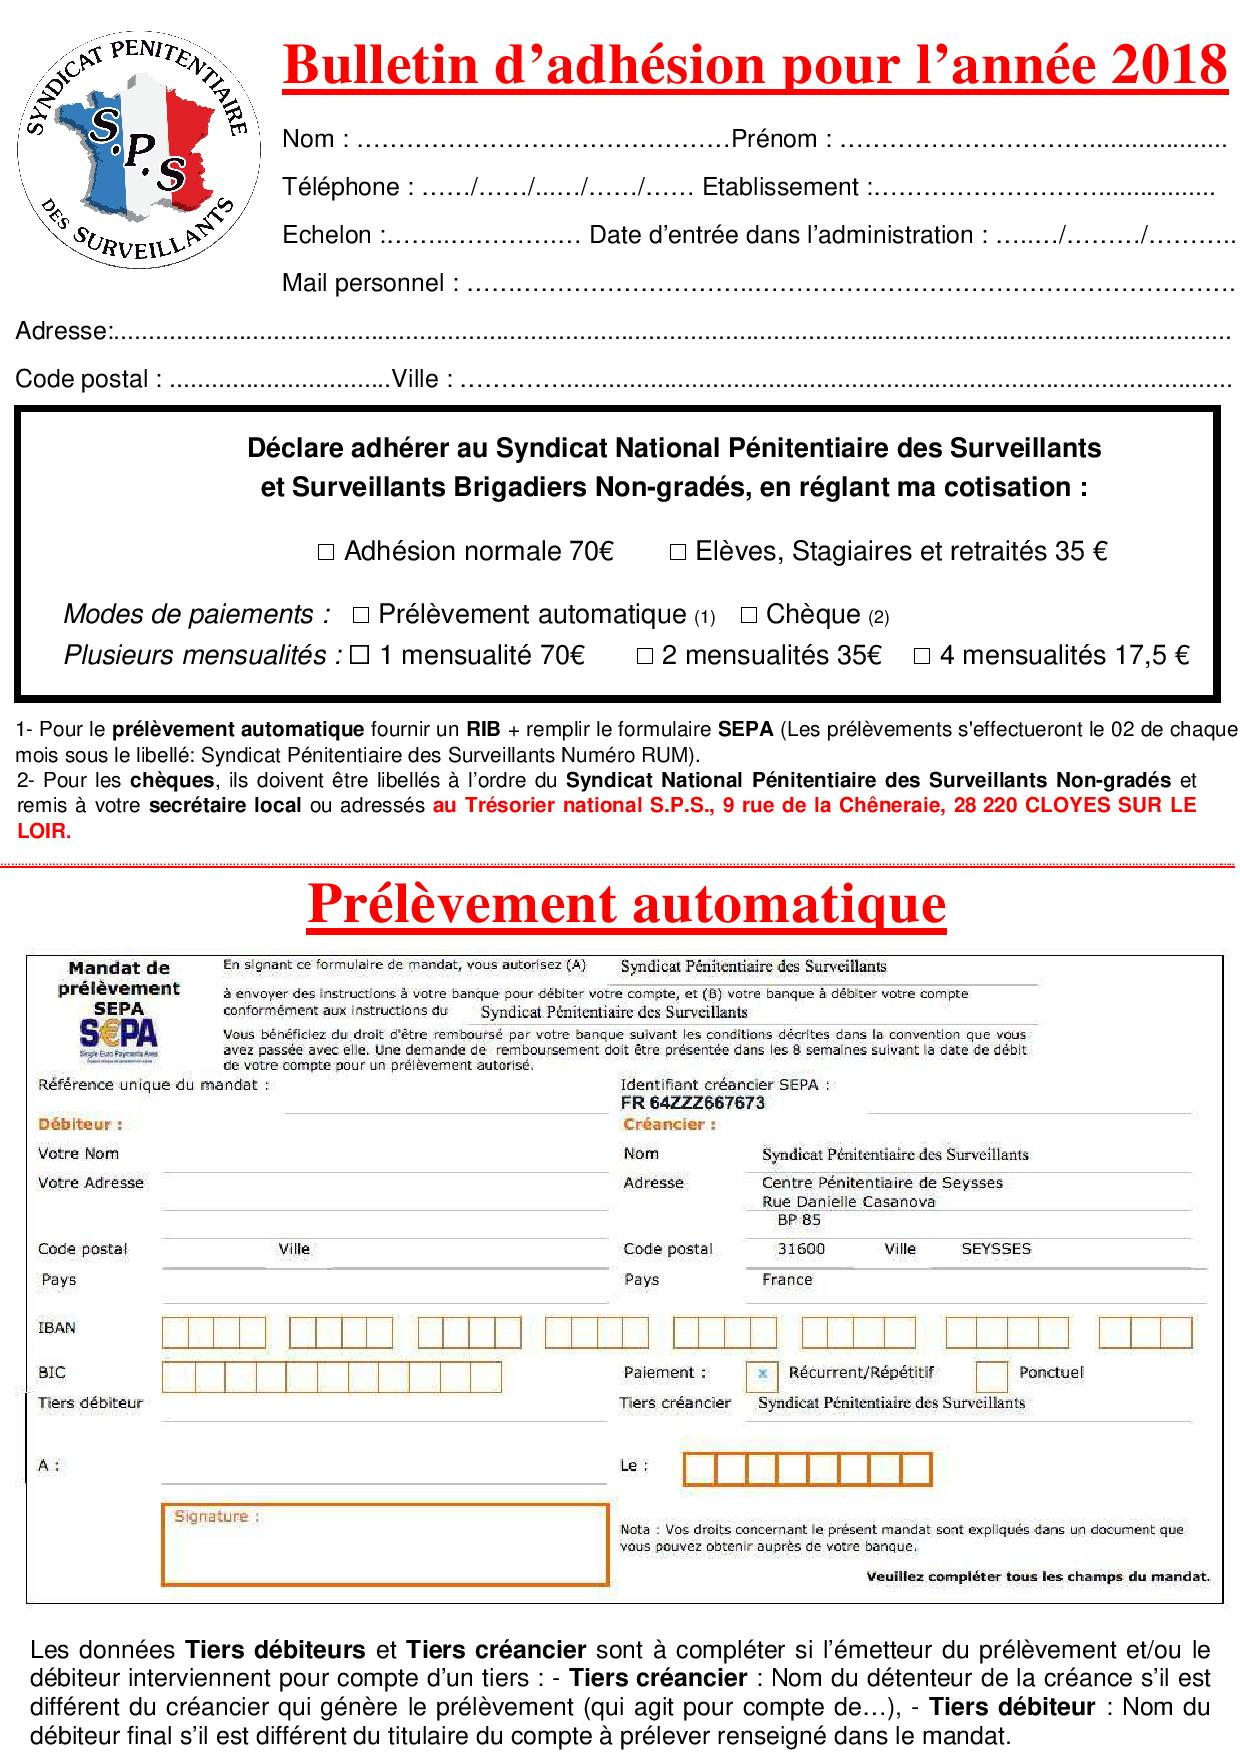 Bulletin d'adhésion 2018